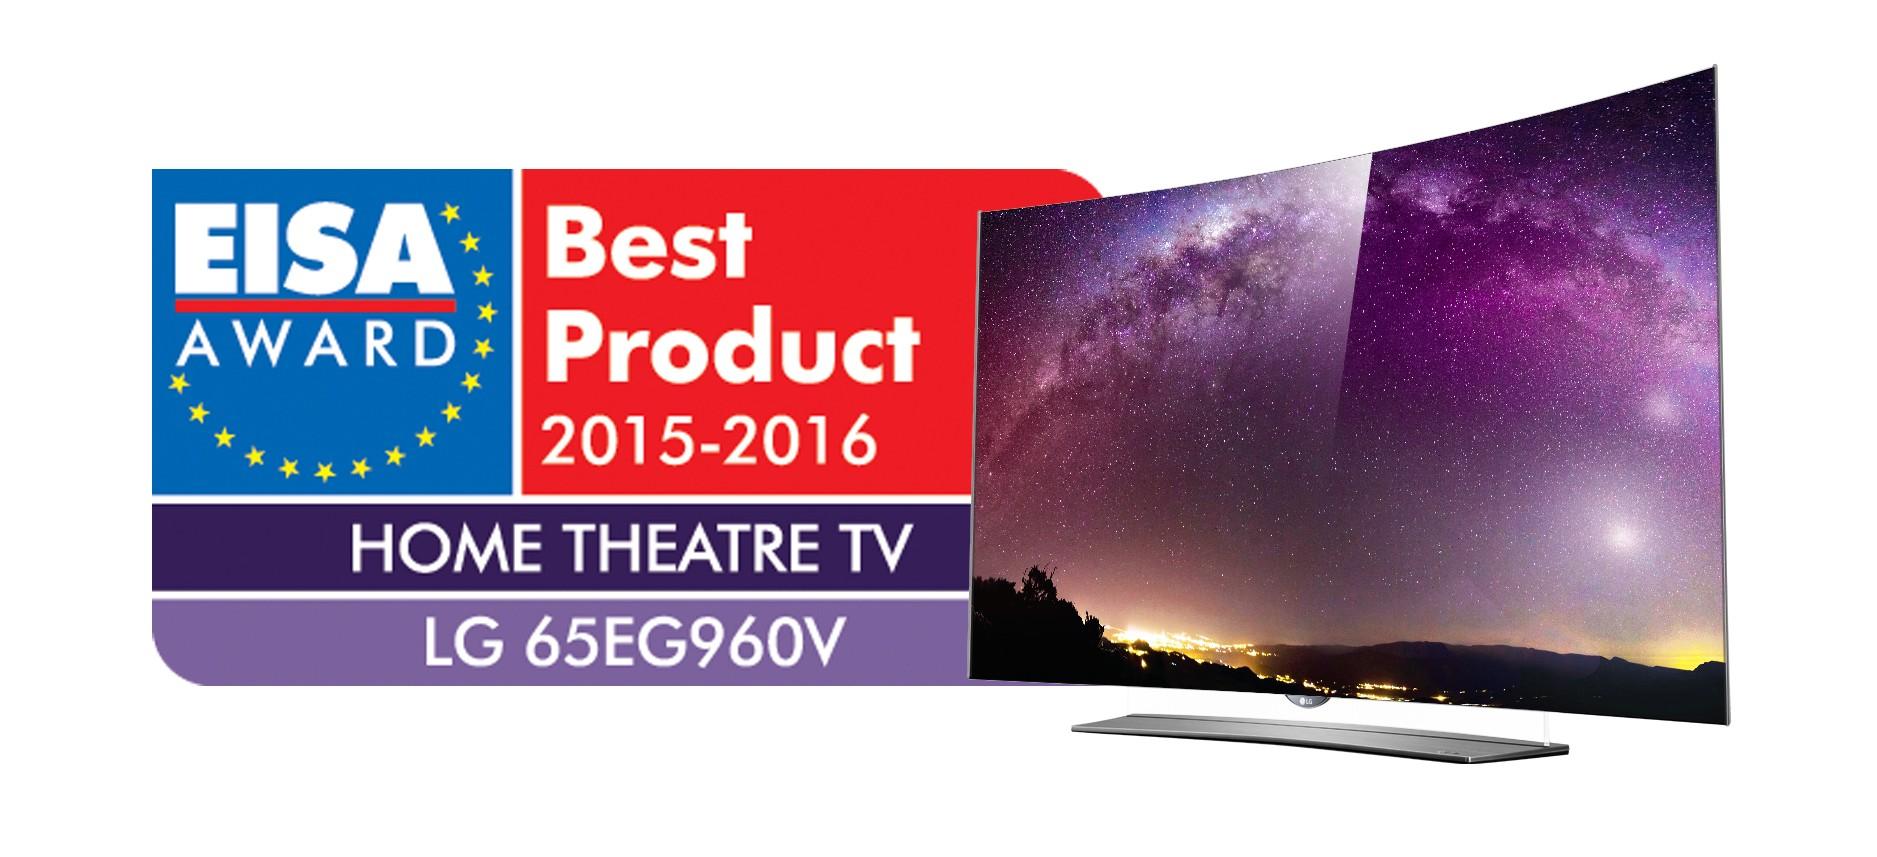 LG's 4K OLED TV (model 65EG960V) won the European Home Theatre TV category at the European Imaging and Sound Association (EISA) Awards.